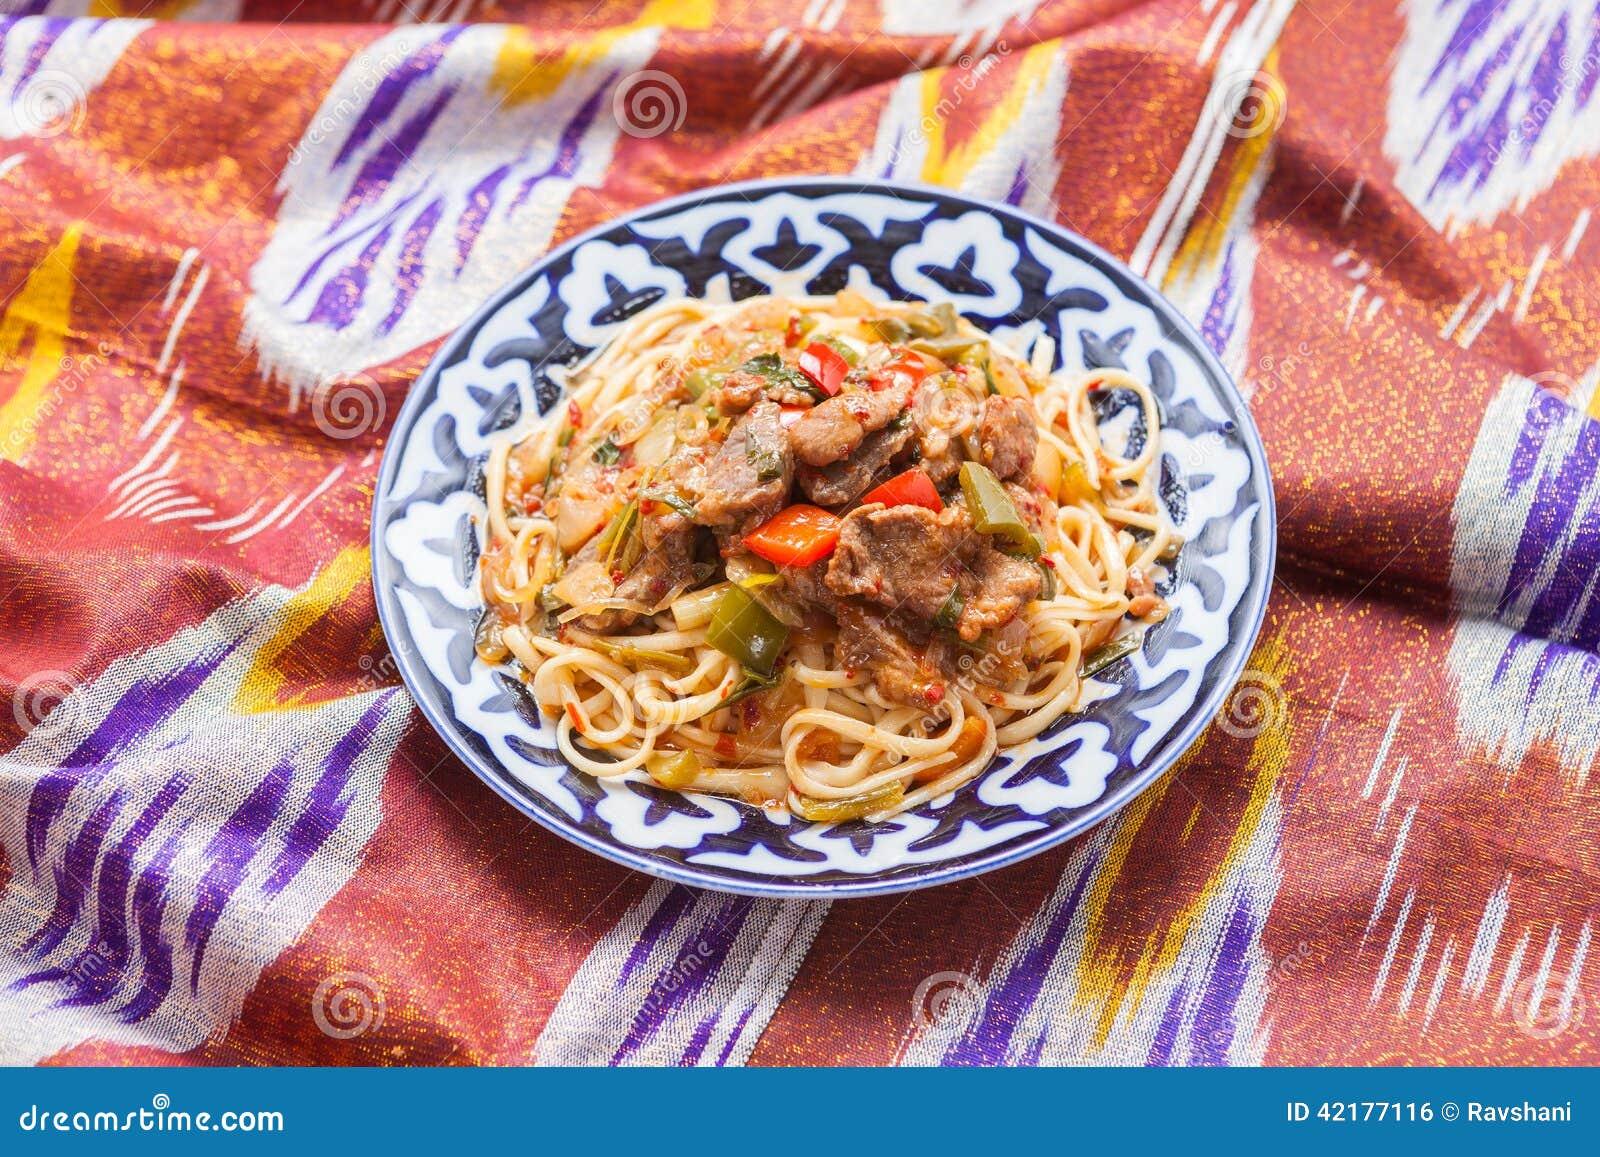 uzbek meals essay